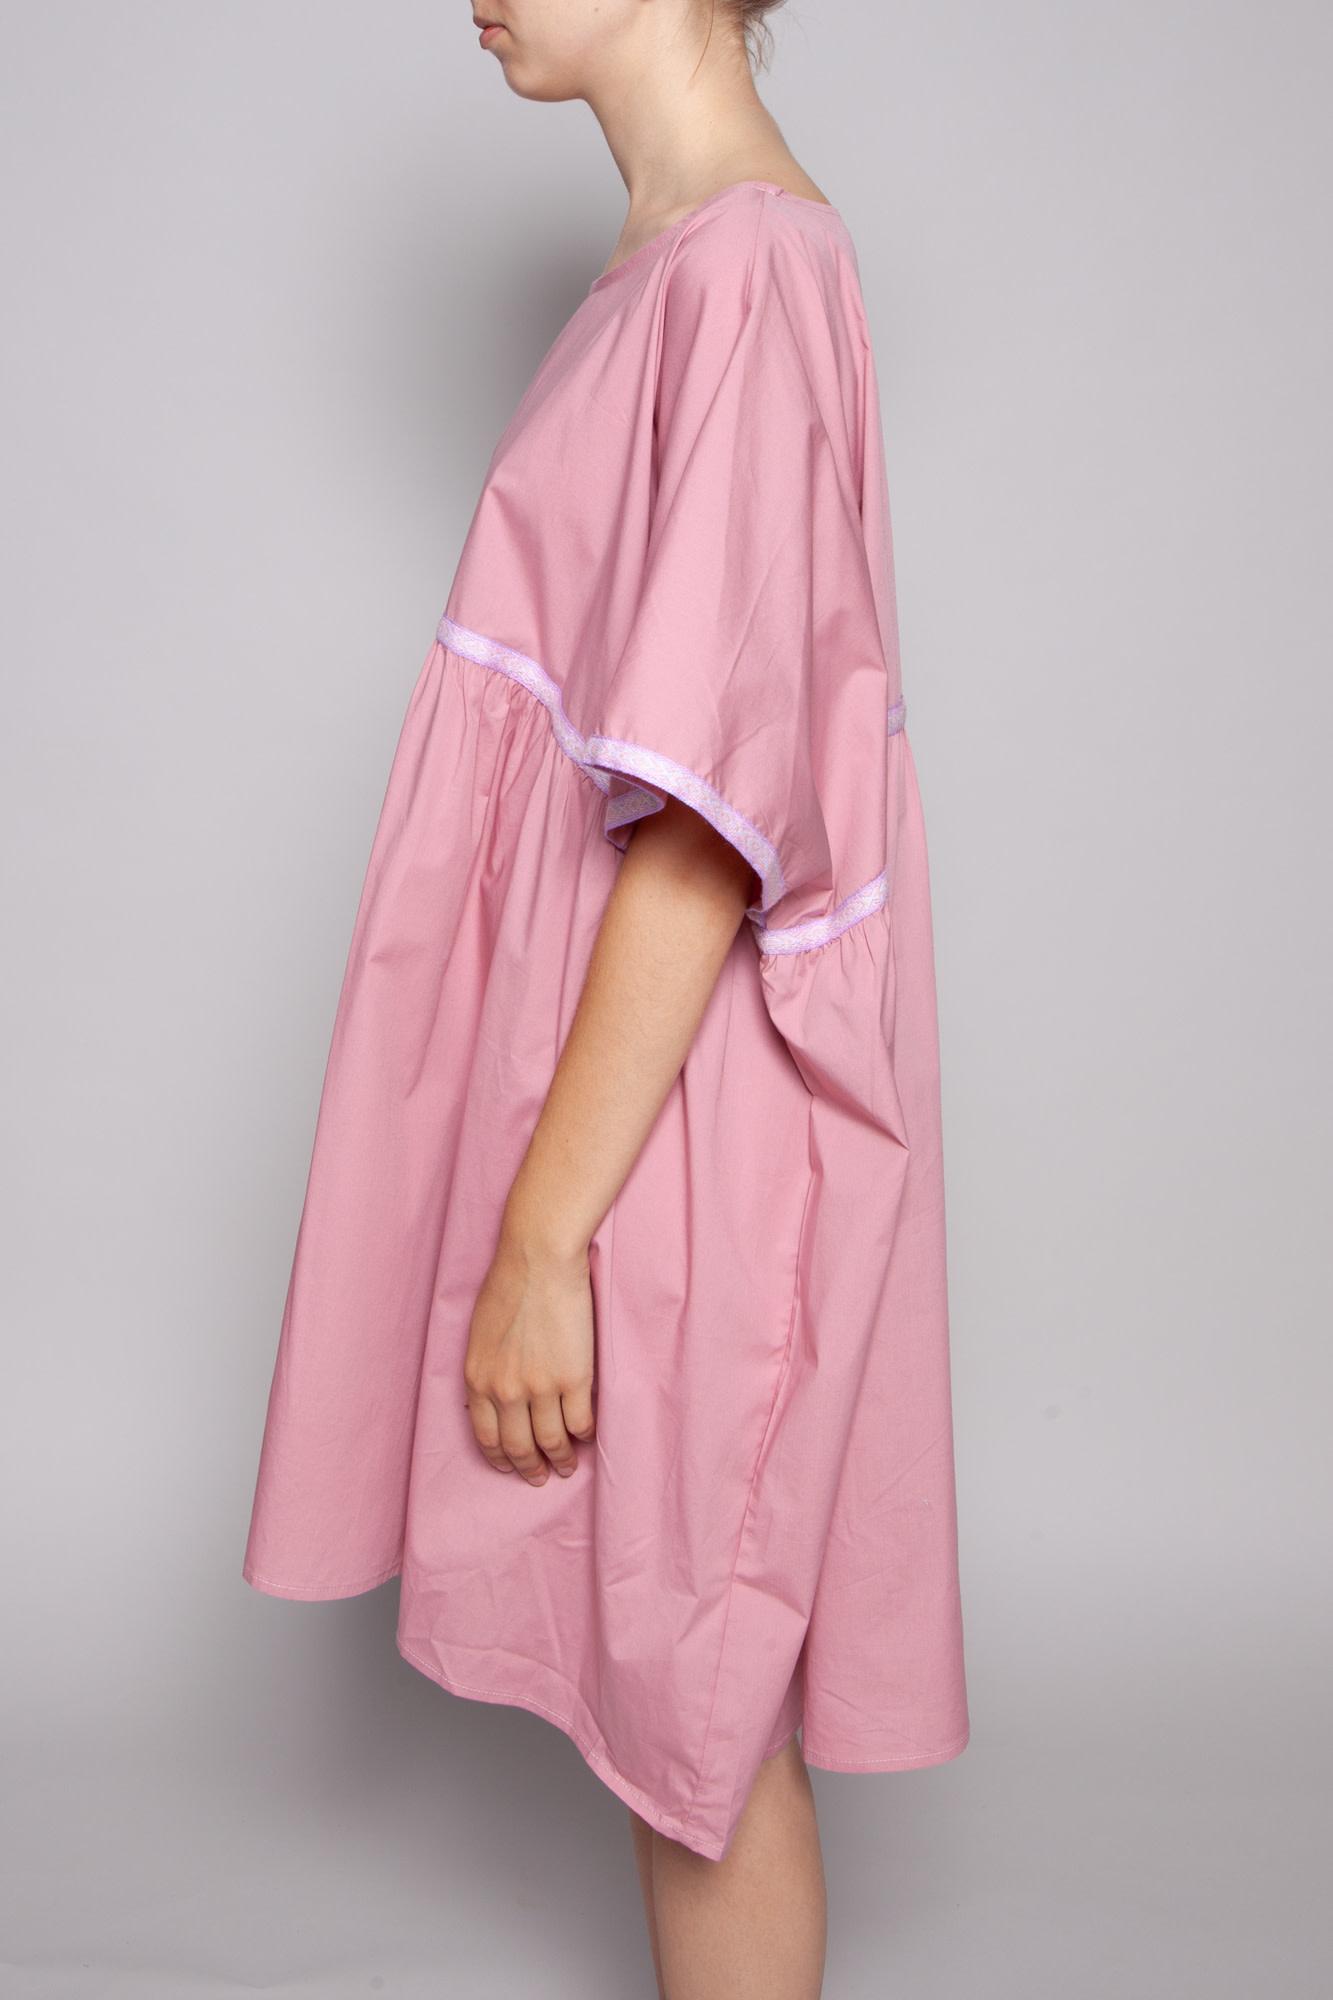 Pitusa EMBROIDERED BLUSH PINK DRESS - NEW